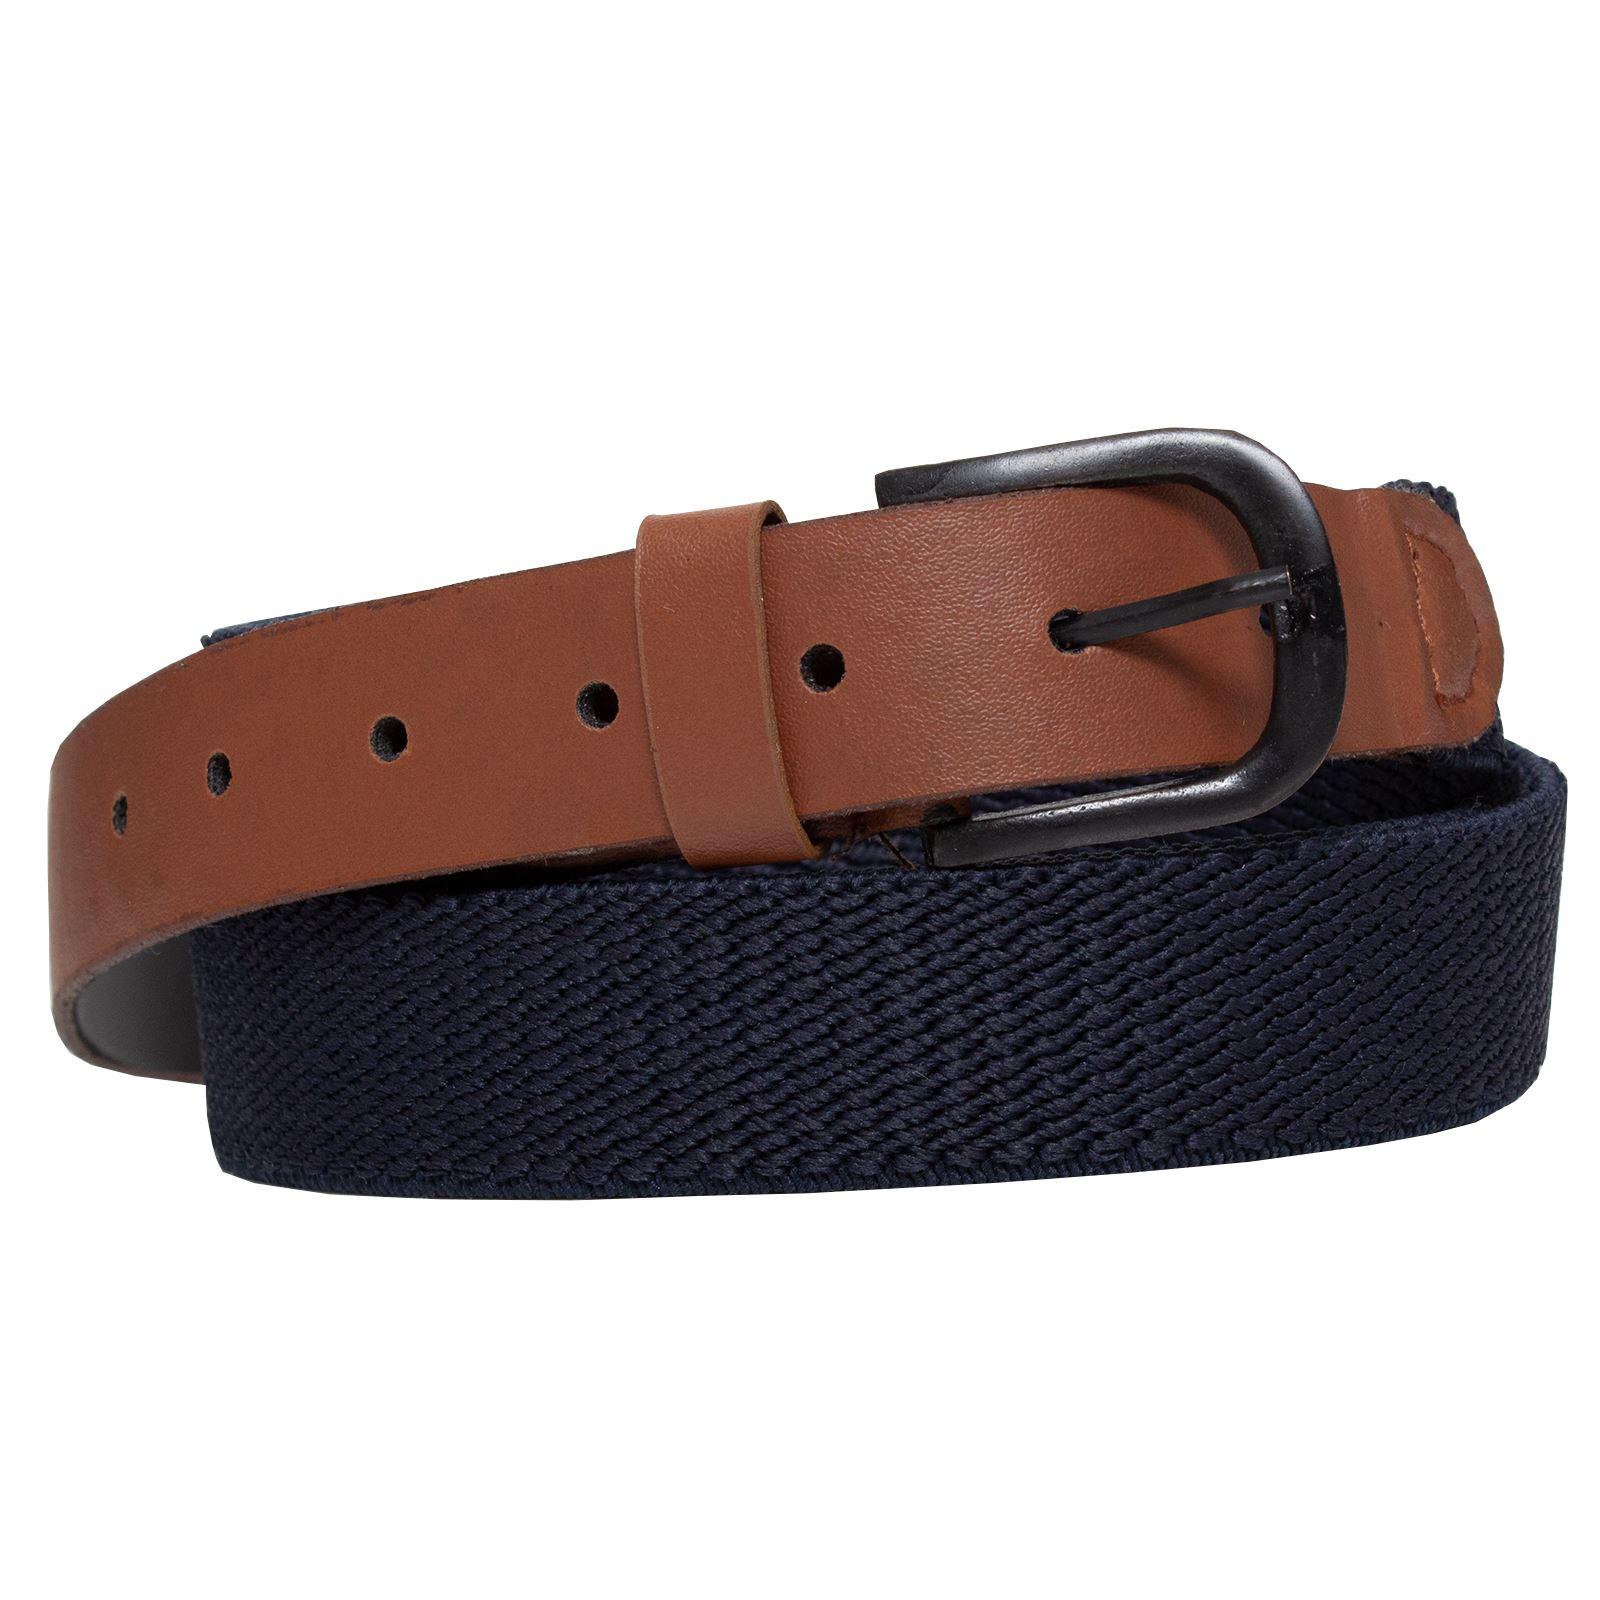 Mens-Ladies-Elasticated-Webbing-Belts-PU-Leather-Trim-Stretch-Canvas-Buckle-Belt Indexbild 3